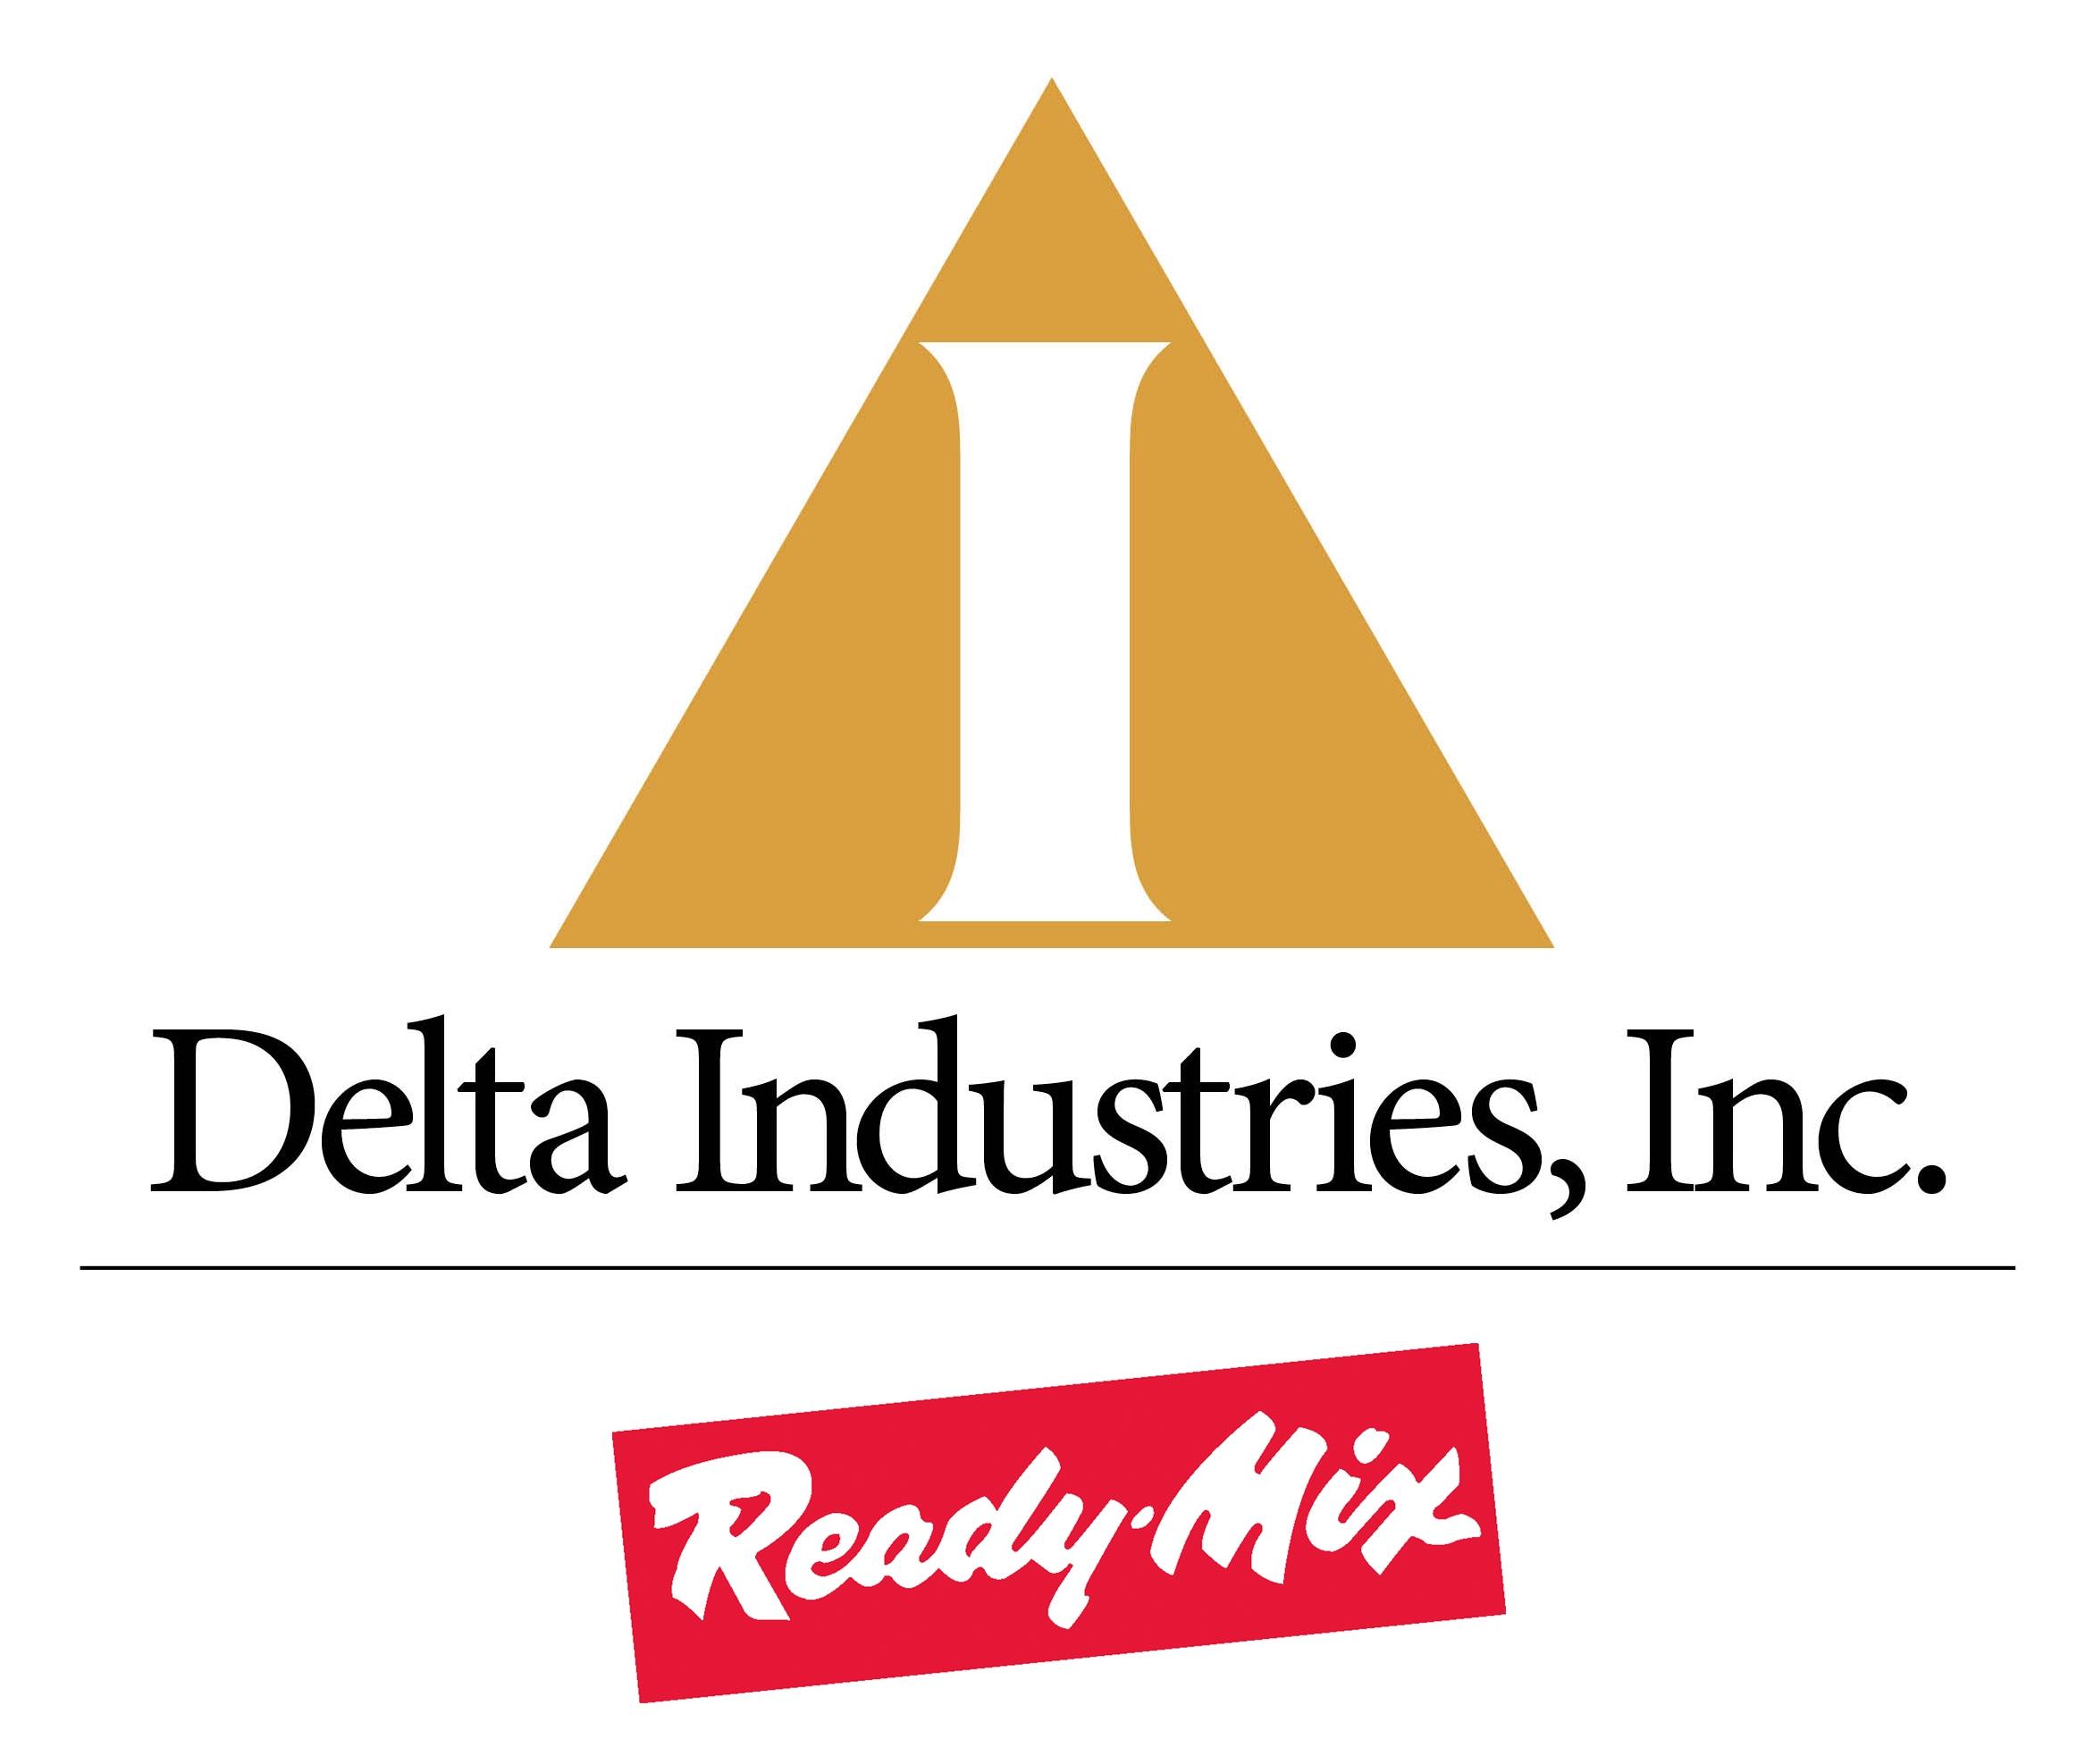 Delta Industries